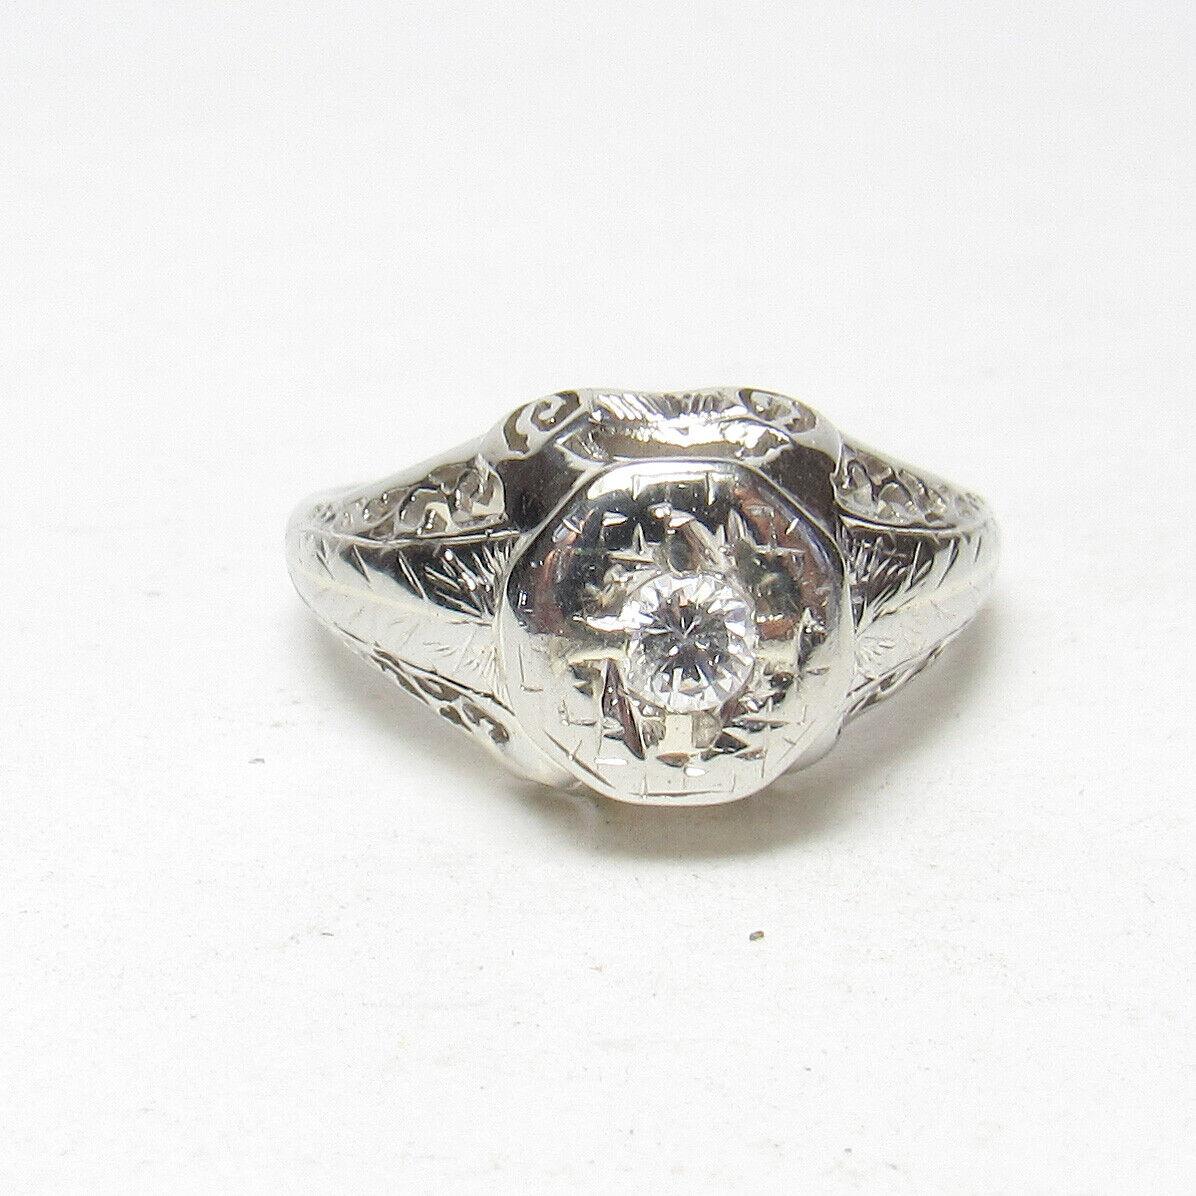 1940s Vintage 18K White gold 0.16 Ct Brilliant Cut Diamond Filigree Ring